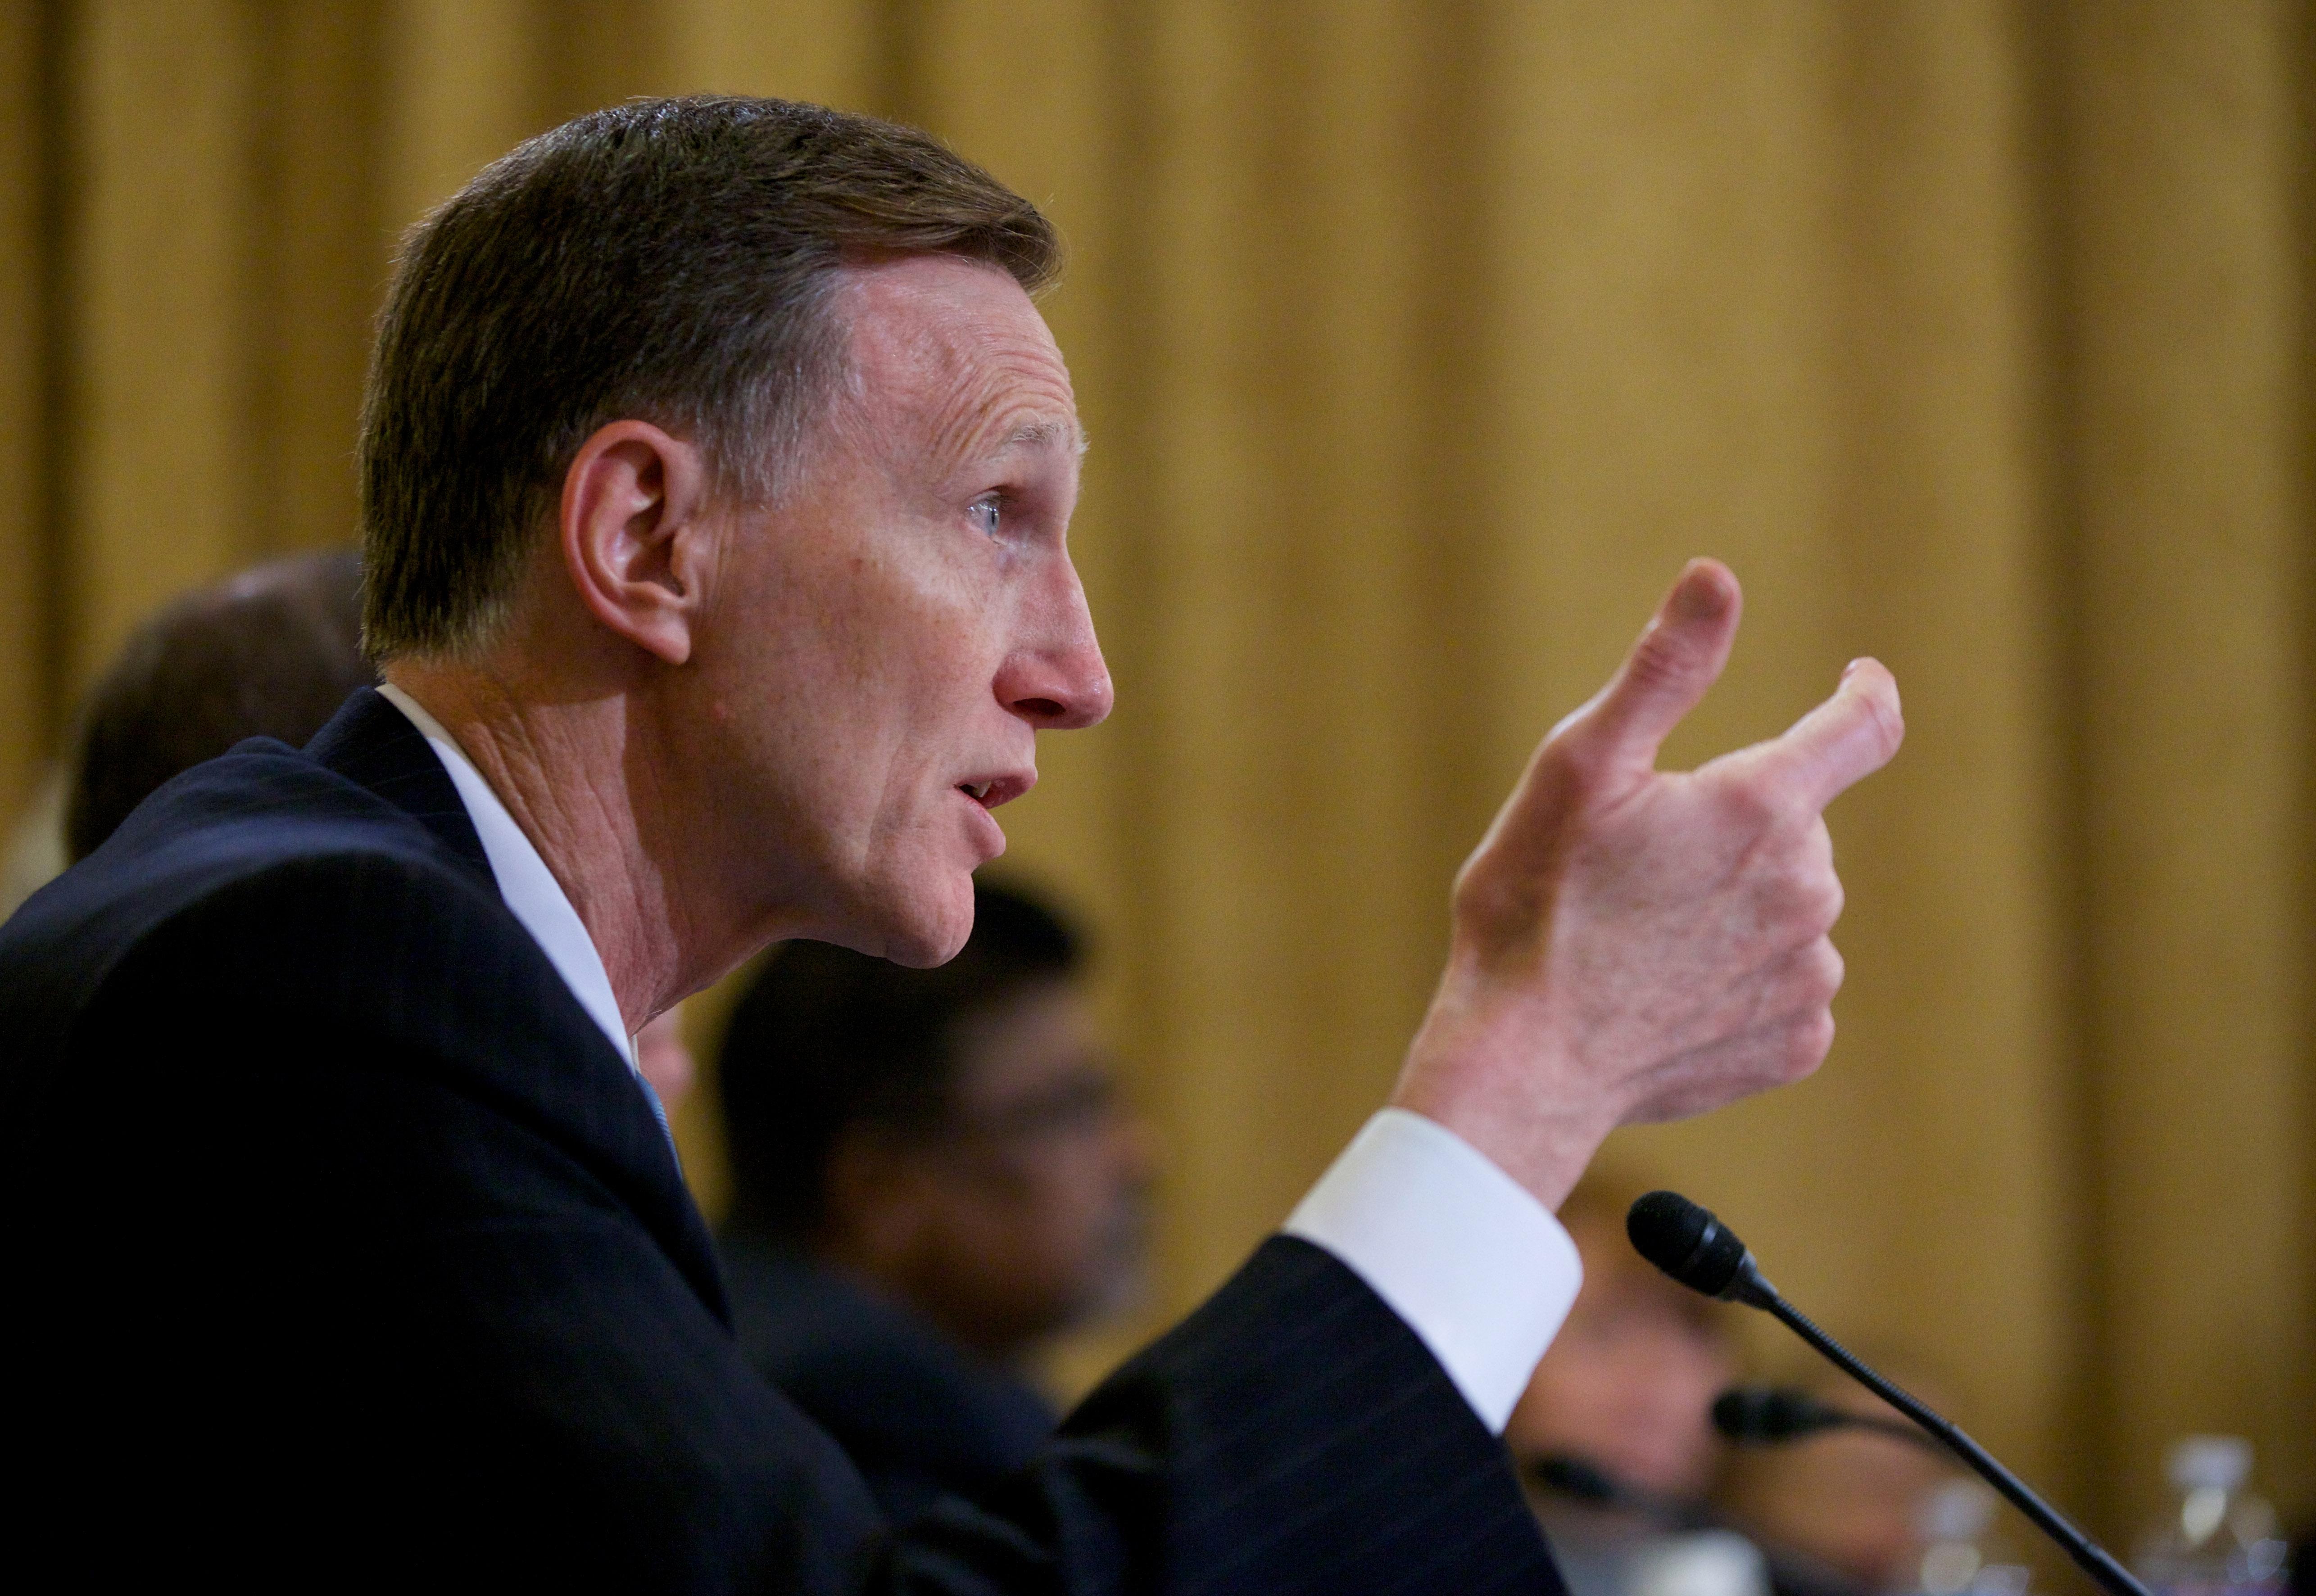 'Innovative terrorists' a growing concern for TSA officials